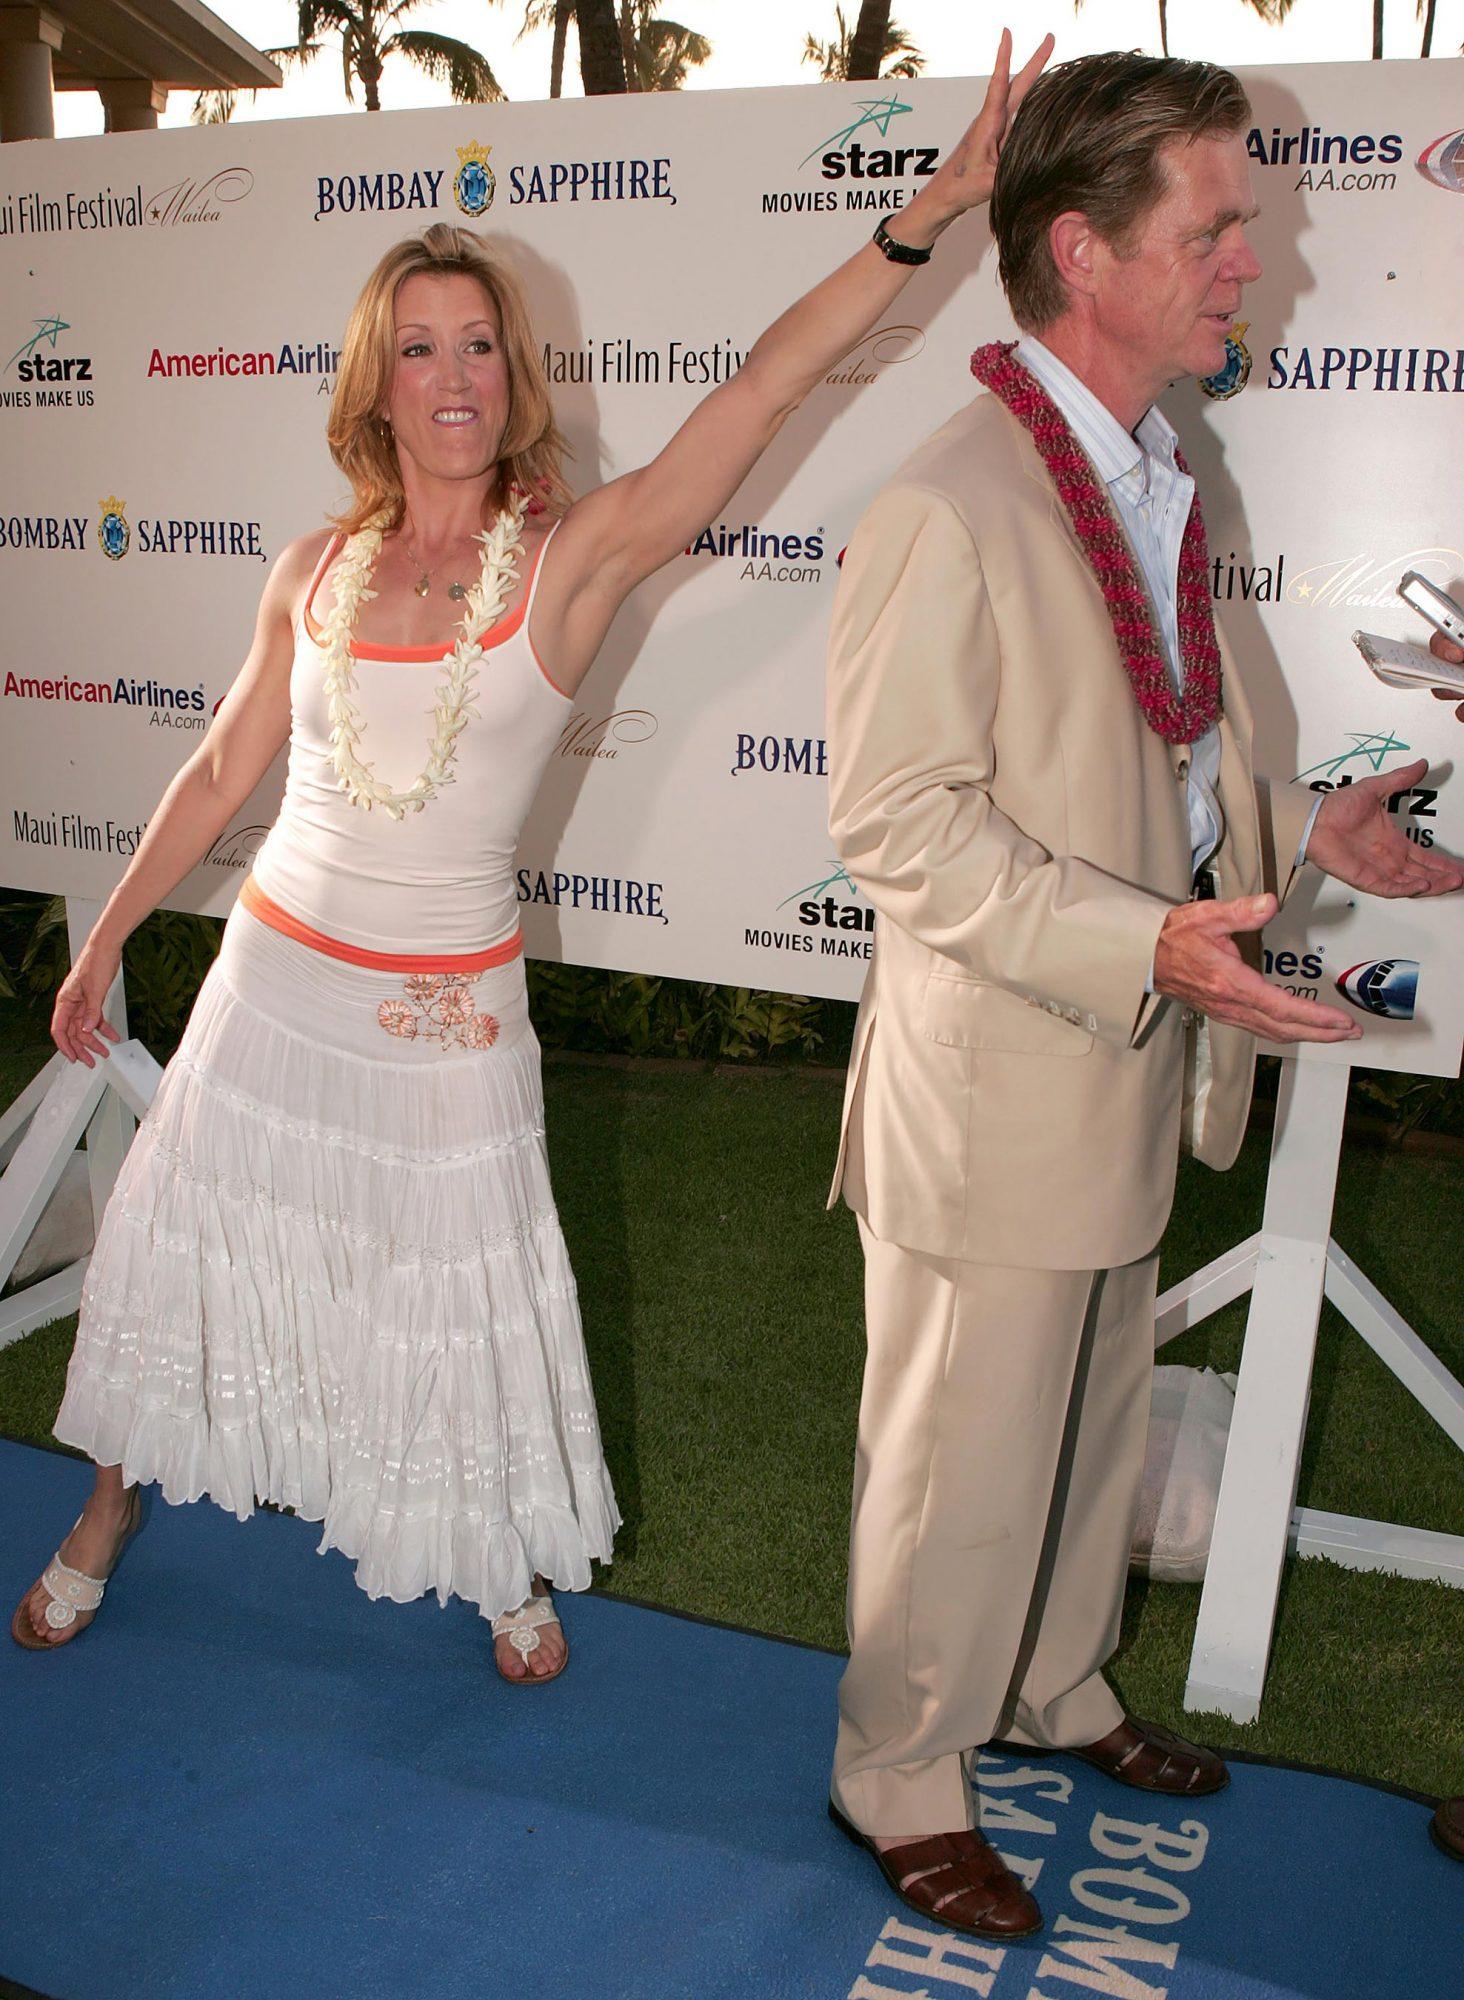 2005 Maui Film Festival - Day Three - Sponsored by Bombay Sapphire